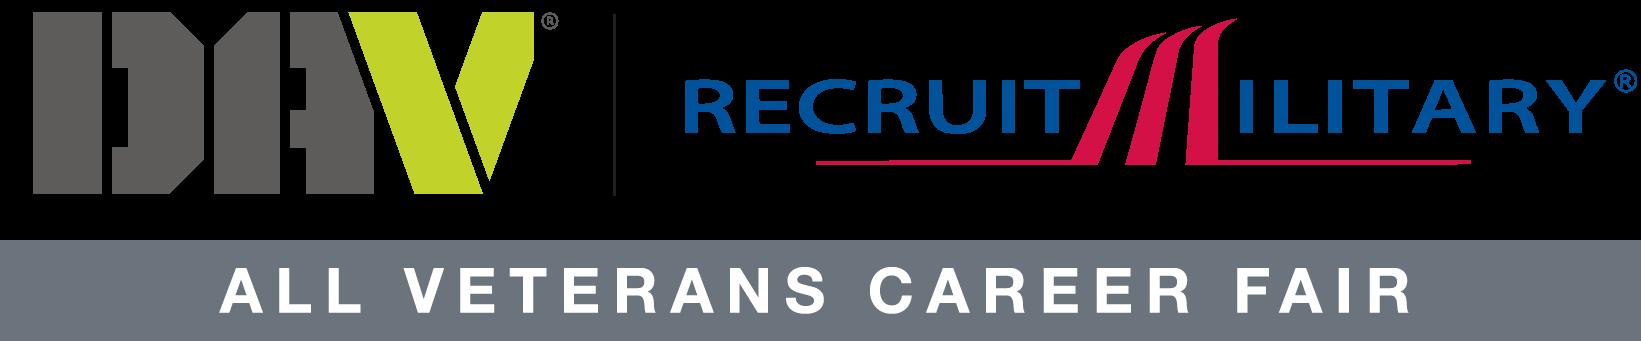 RecruitMilitary, LLC